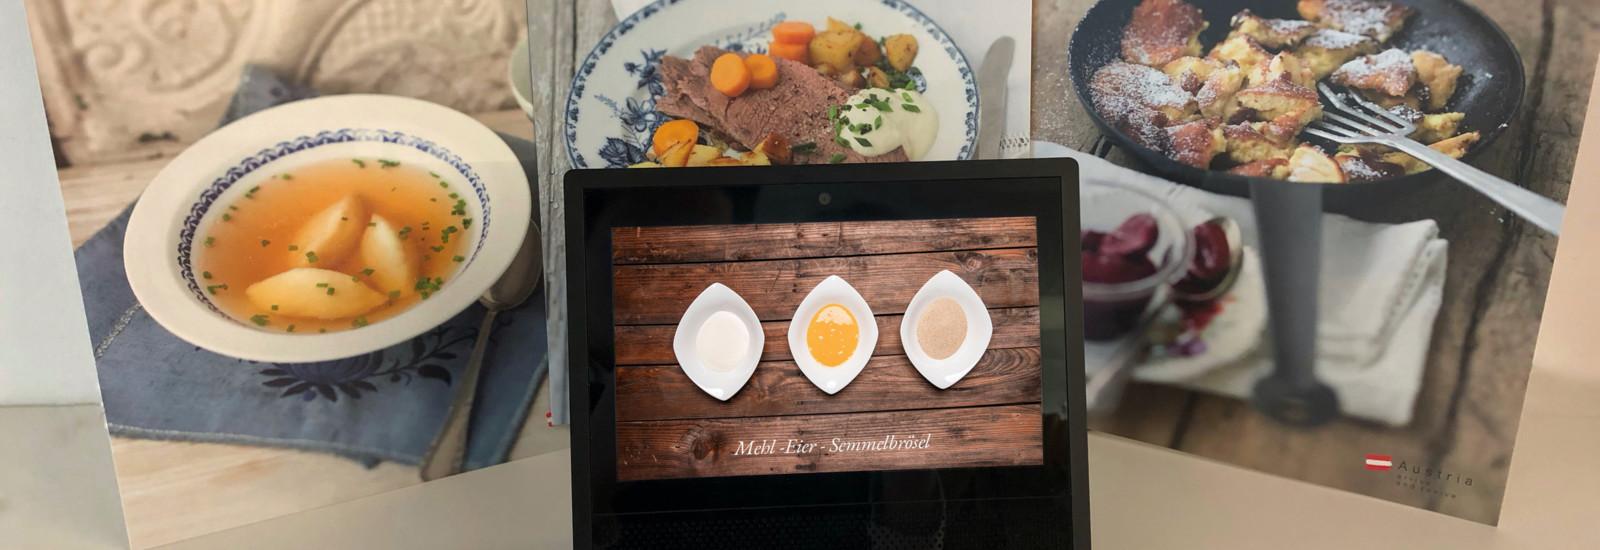 Amazon Alexa Skill - Österreich Werbung